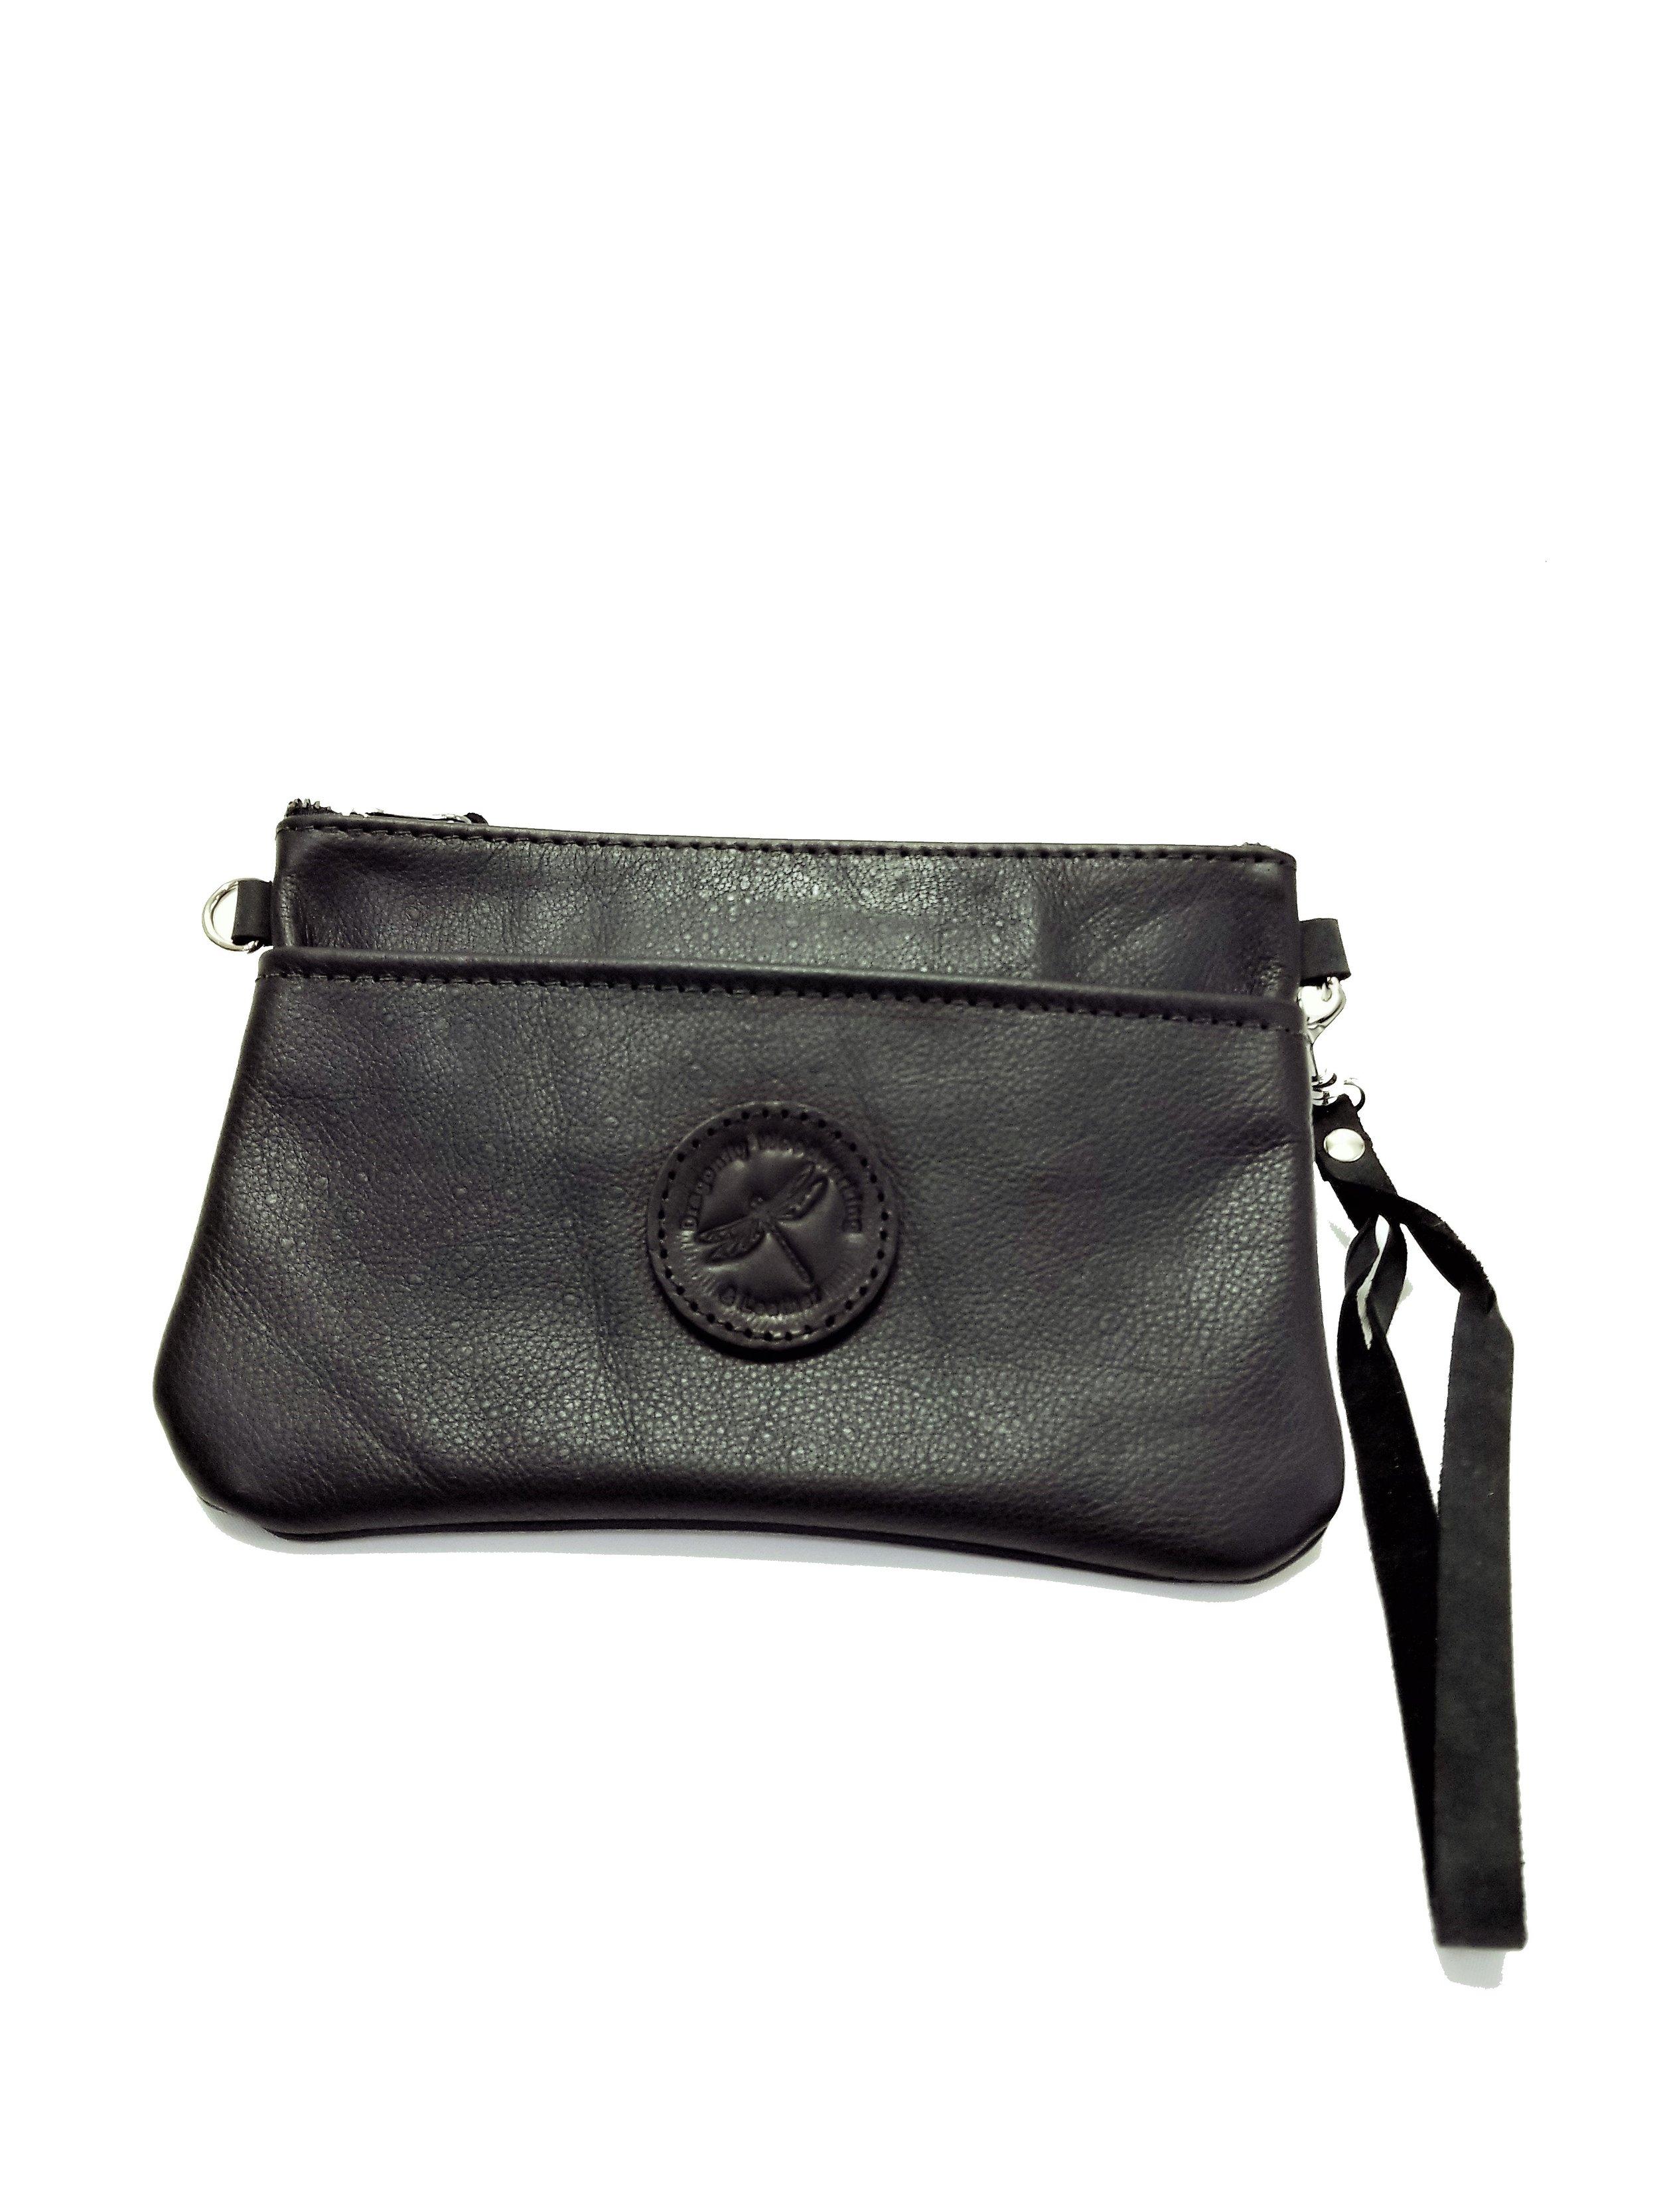 Black Leather Purse / Clutch